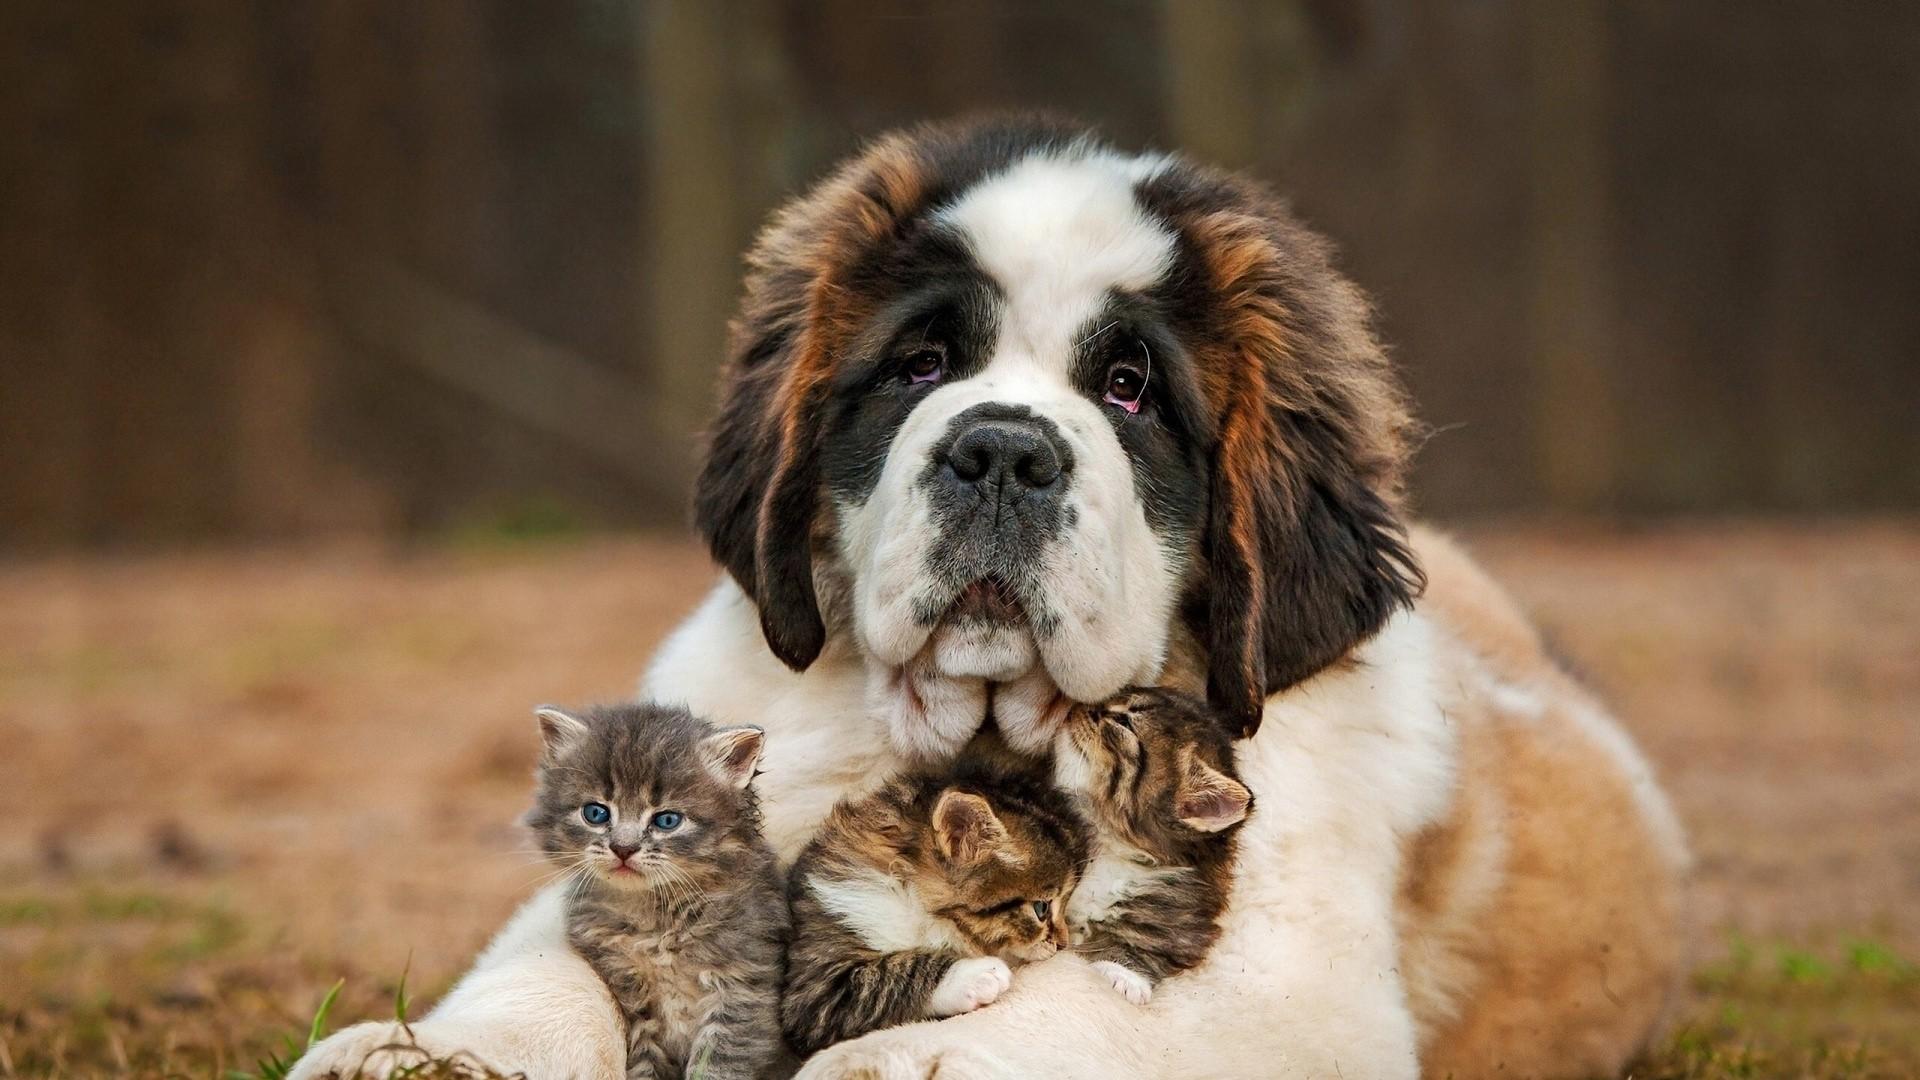 Cute baby cat and big dog nice animal wallpaper